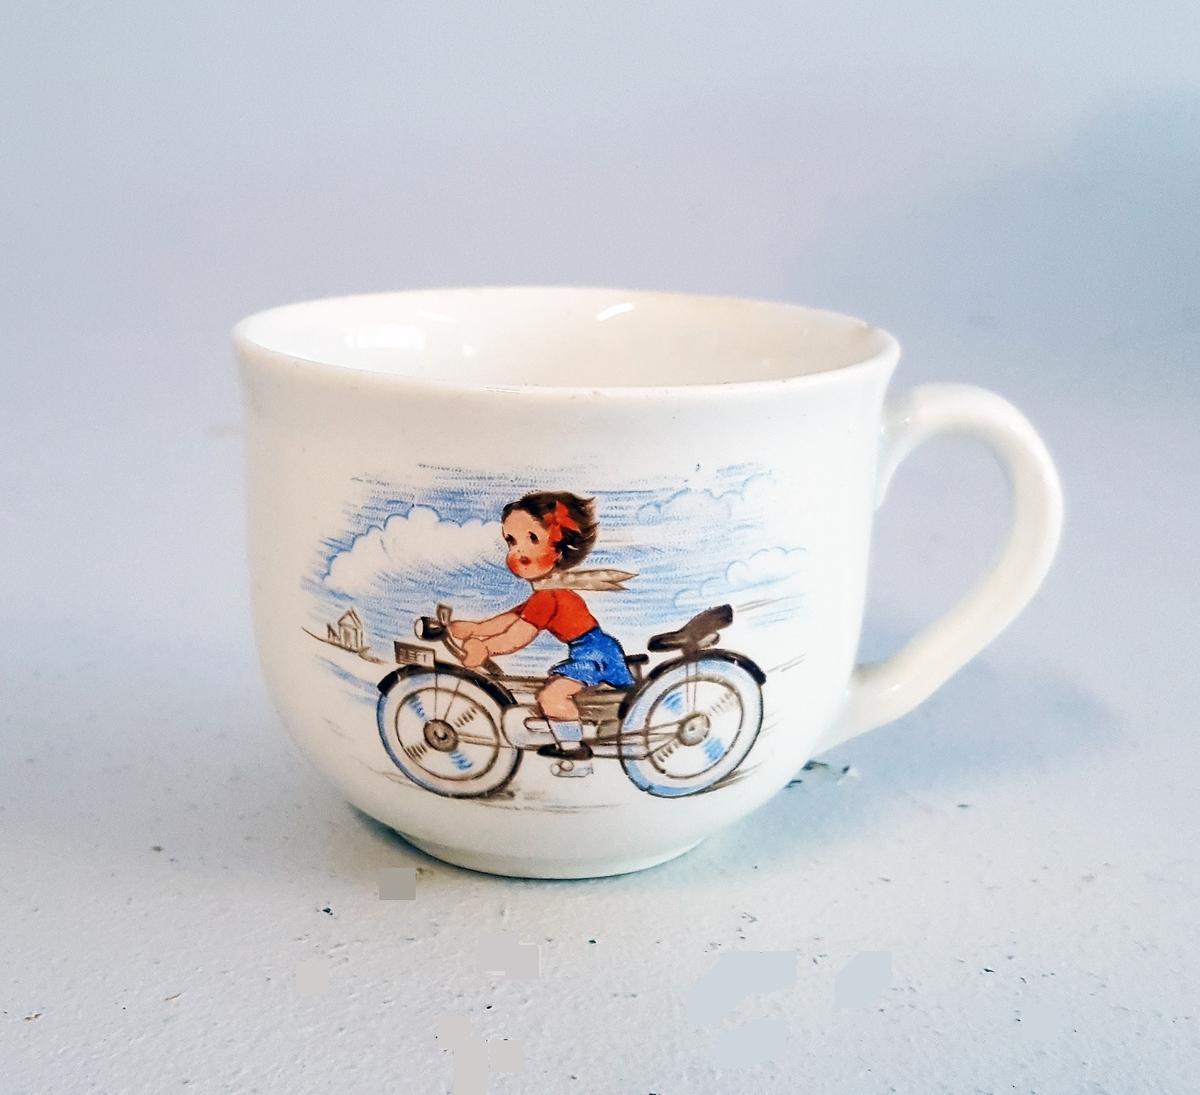 Barnekopp med motiv an jente på motorsykkel